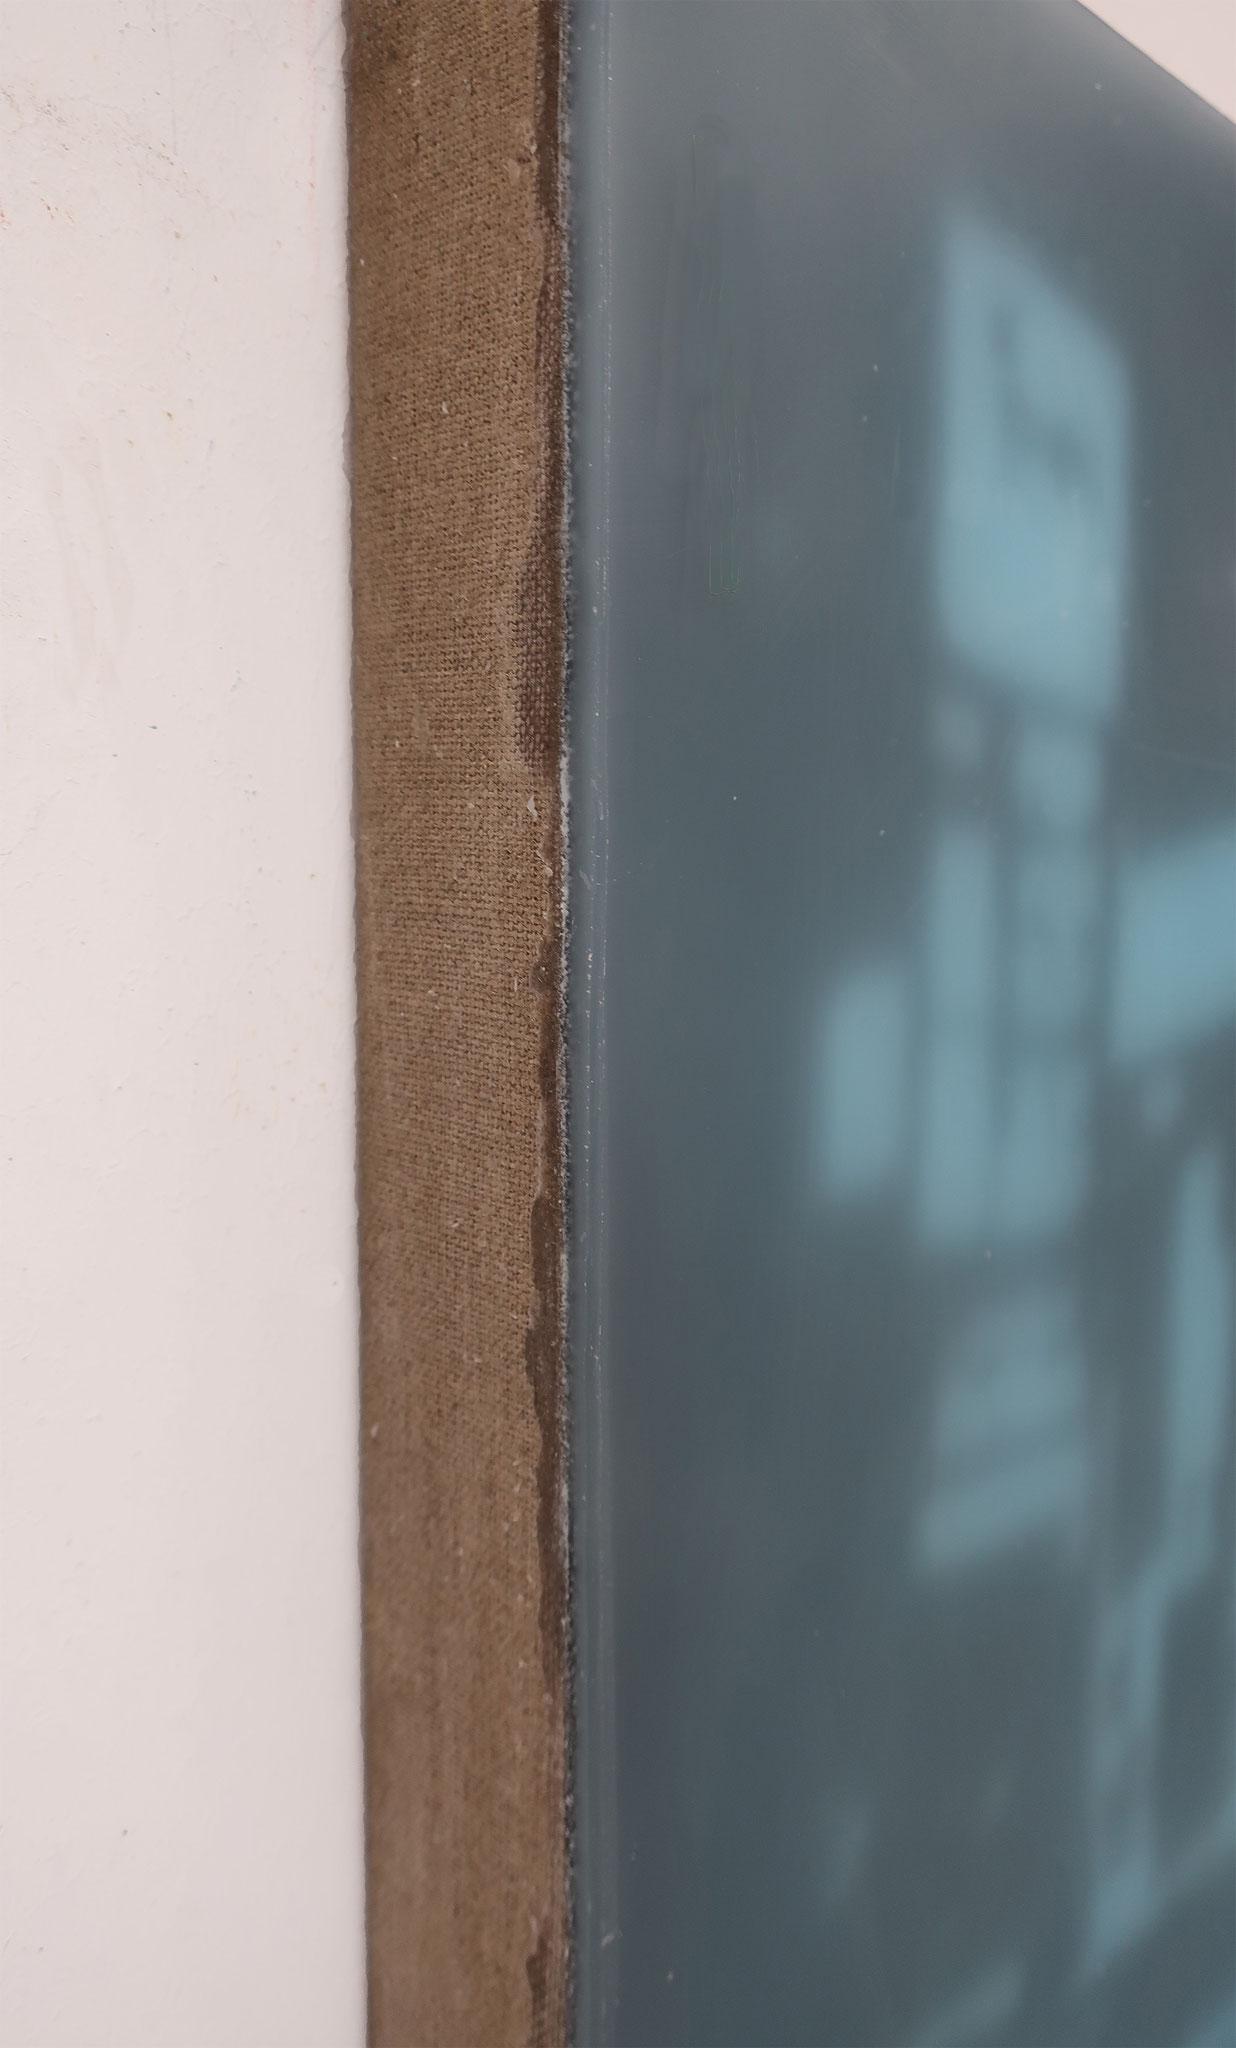 Johannes Kriesche 2016, Lichttempel, Detail, Paraffin, 60x80